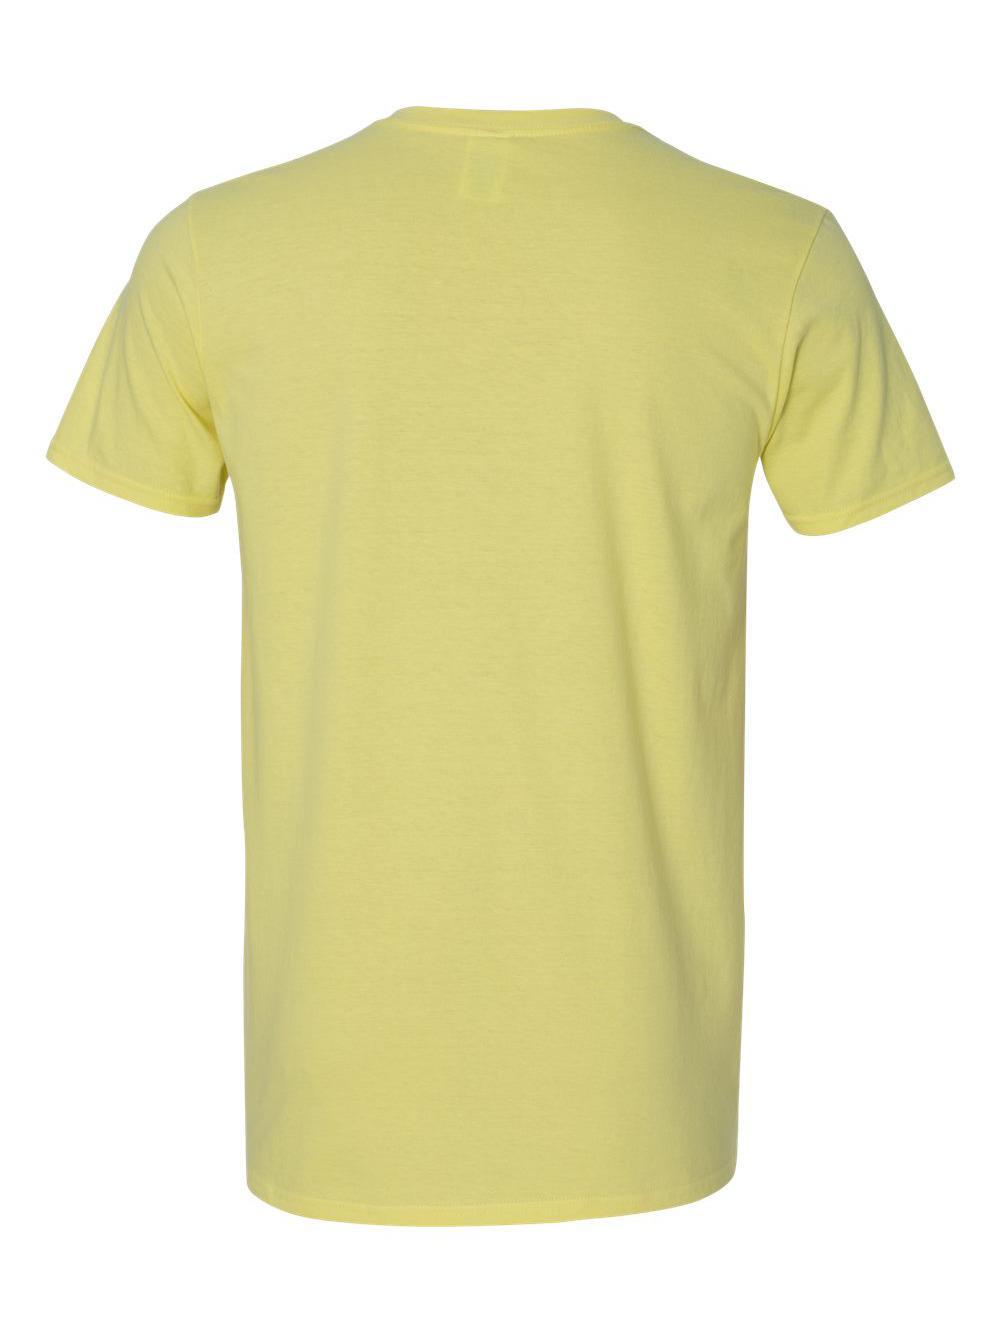 Gildan-Softstyle-T-Shirt-64000 thumbnail 40